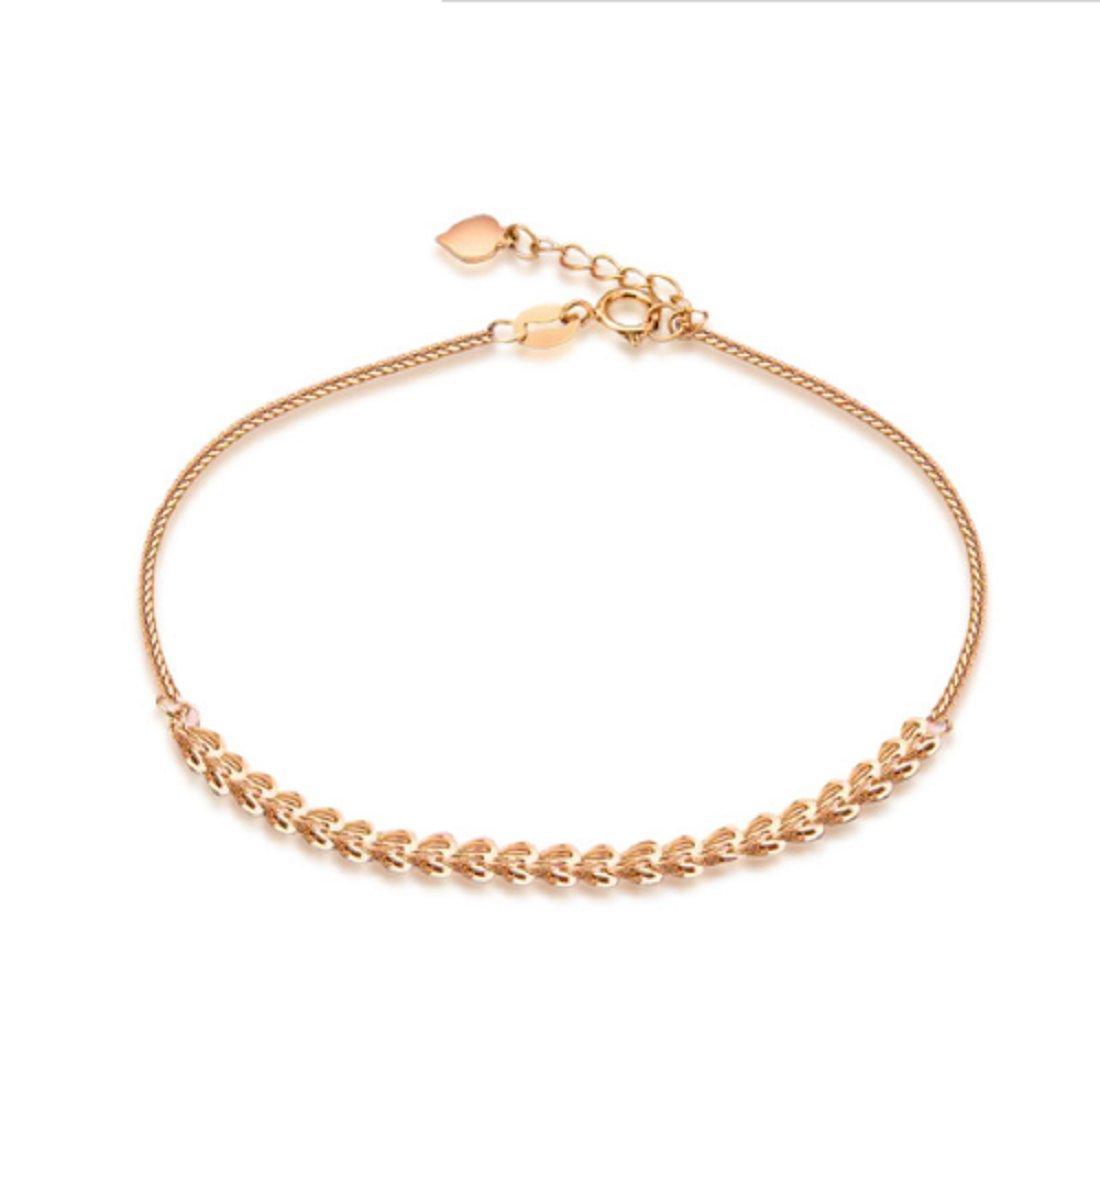 GOWE Luxury 18K Rose Gold Pteris Chain Women Bracelets Lady Wedding Engagement 19cm Bracelets by GOWE